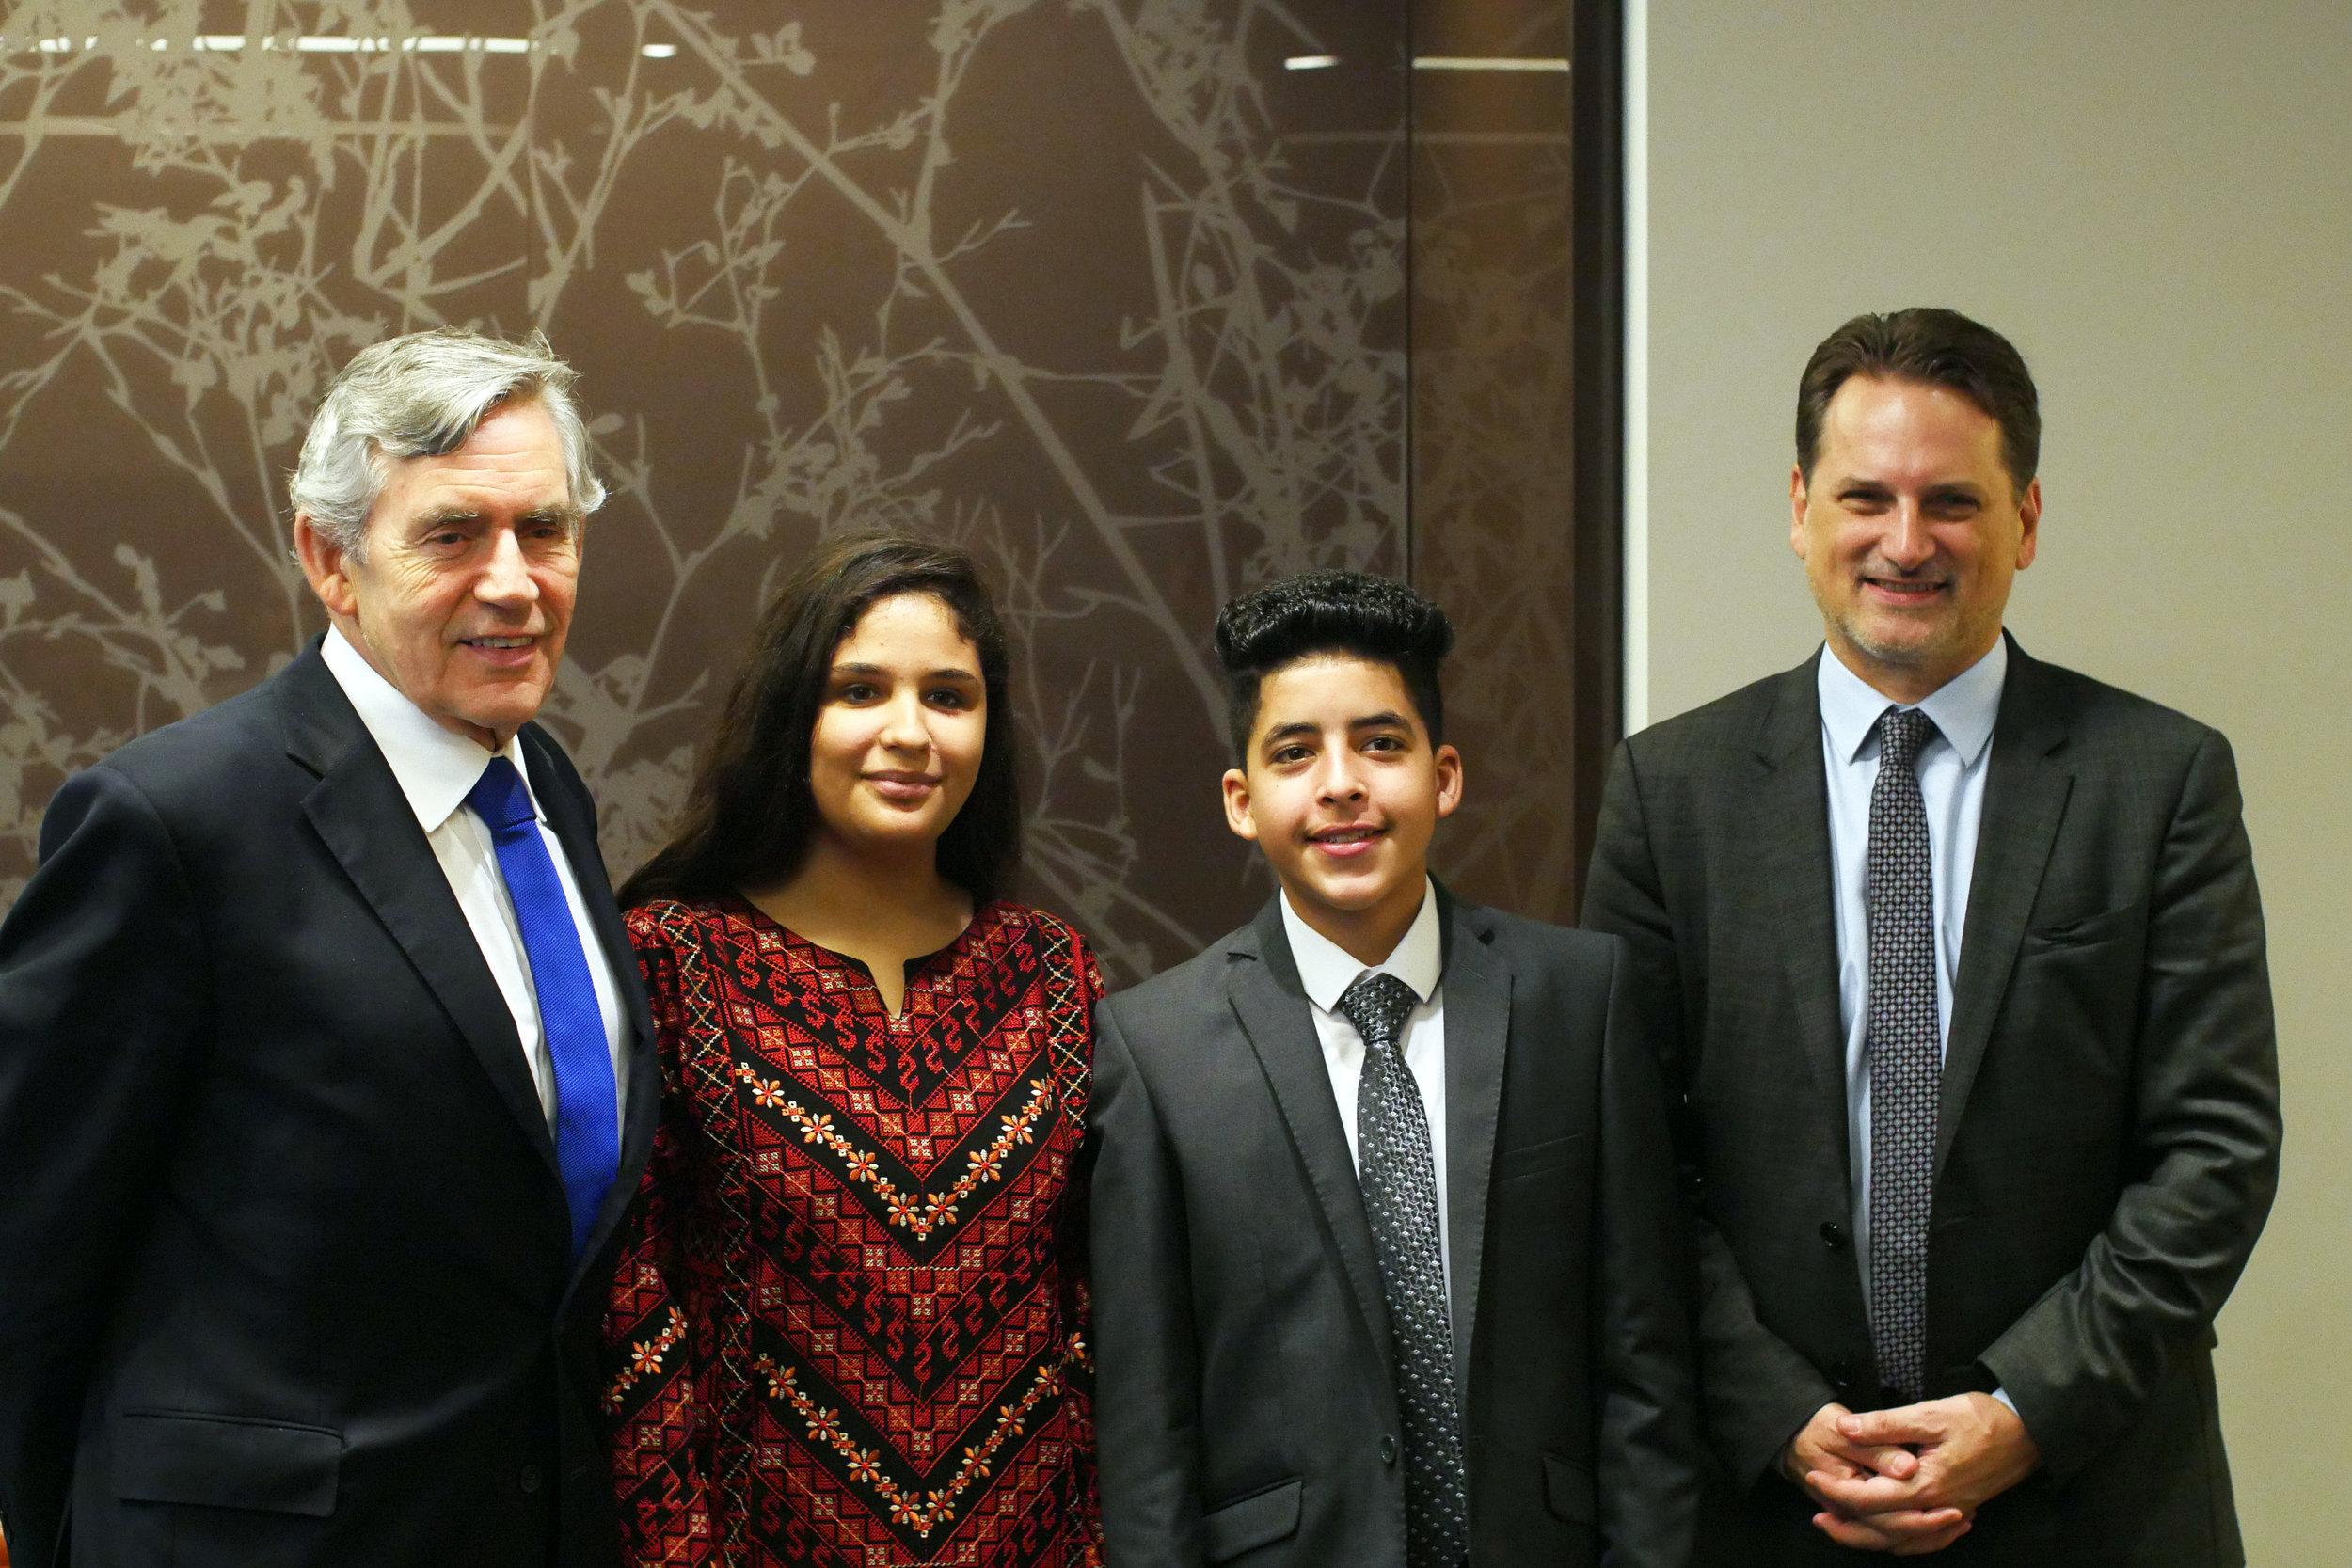 From left to right, former British Prime Minister Gordon Brown, Aseel, Ahmad and UNRWA Commissioner-General Pierre Krähenbühl. (Courtesy of Ozlem Eskiocak / UNRWA)